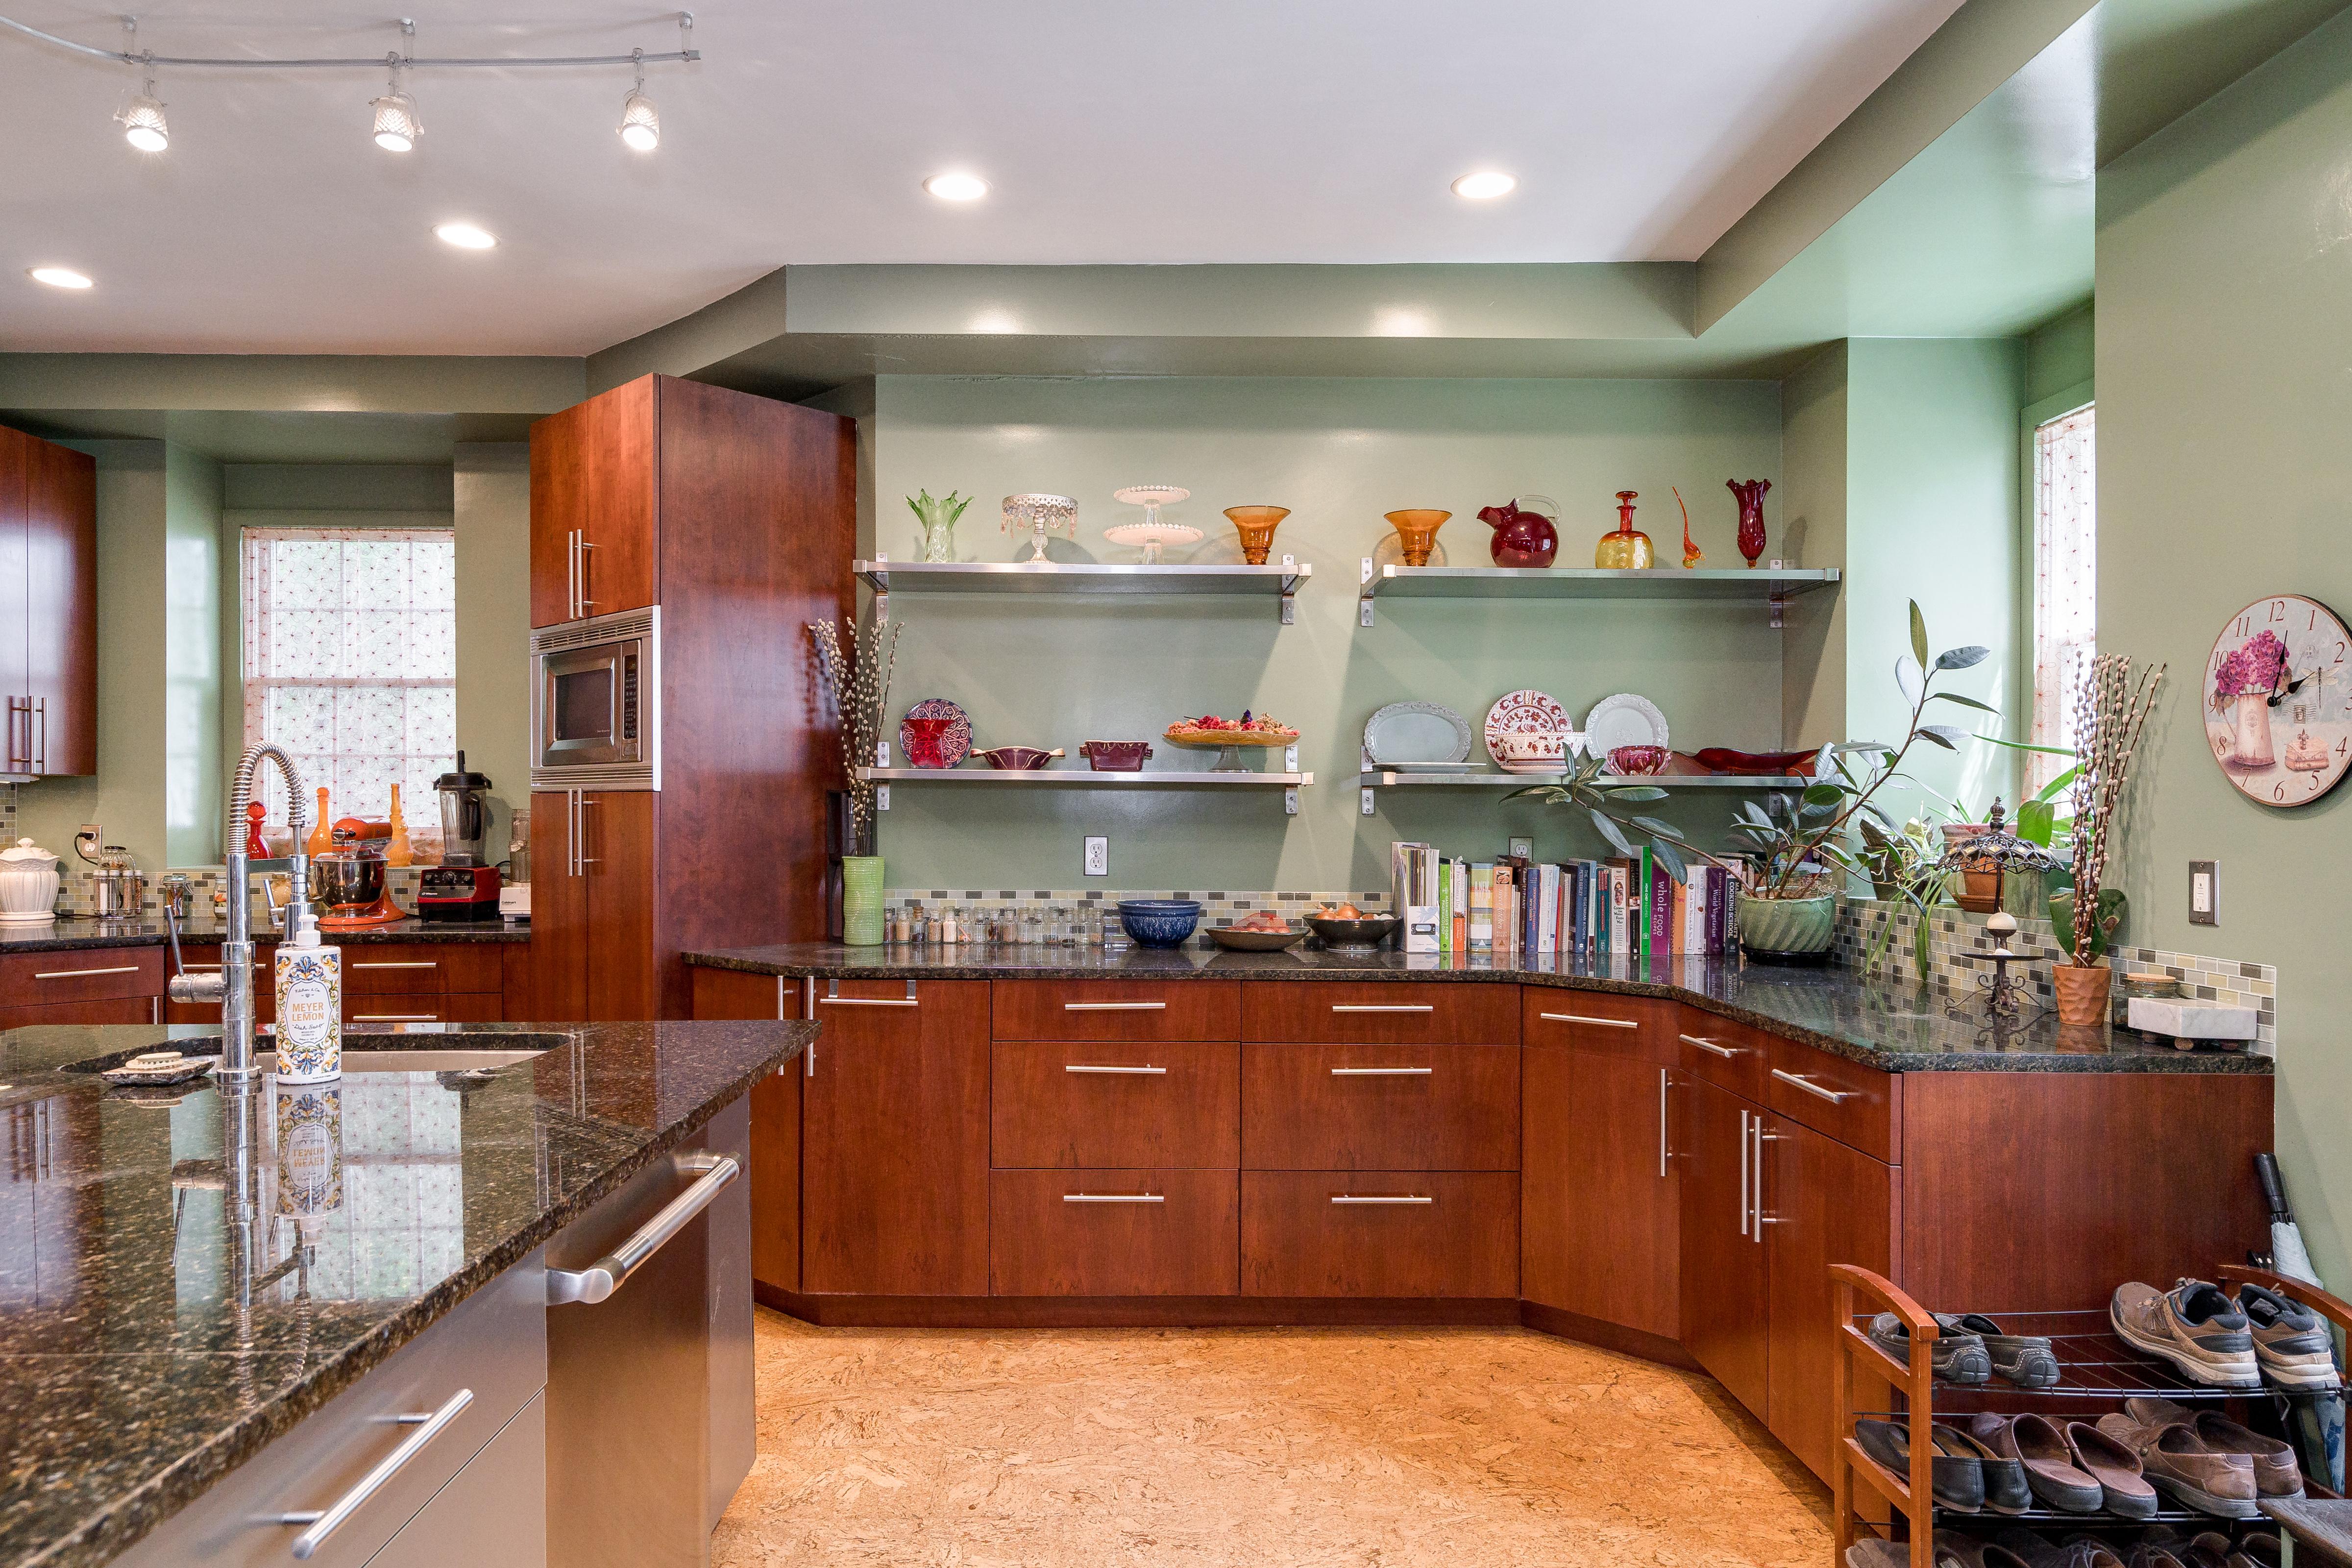 16-williams-st-easton-kitchen-shelving